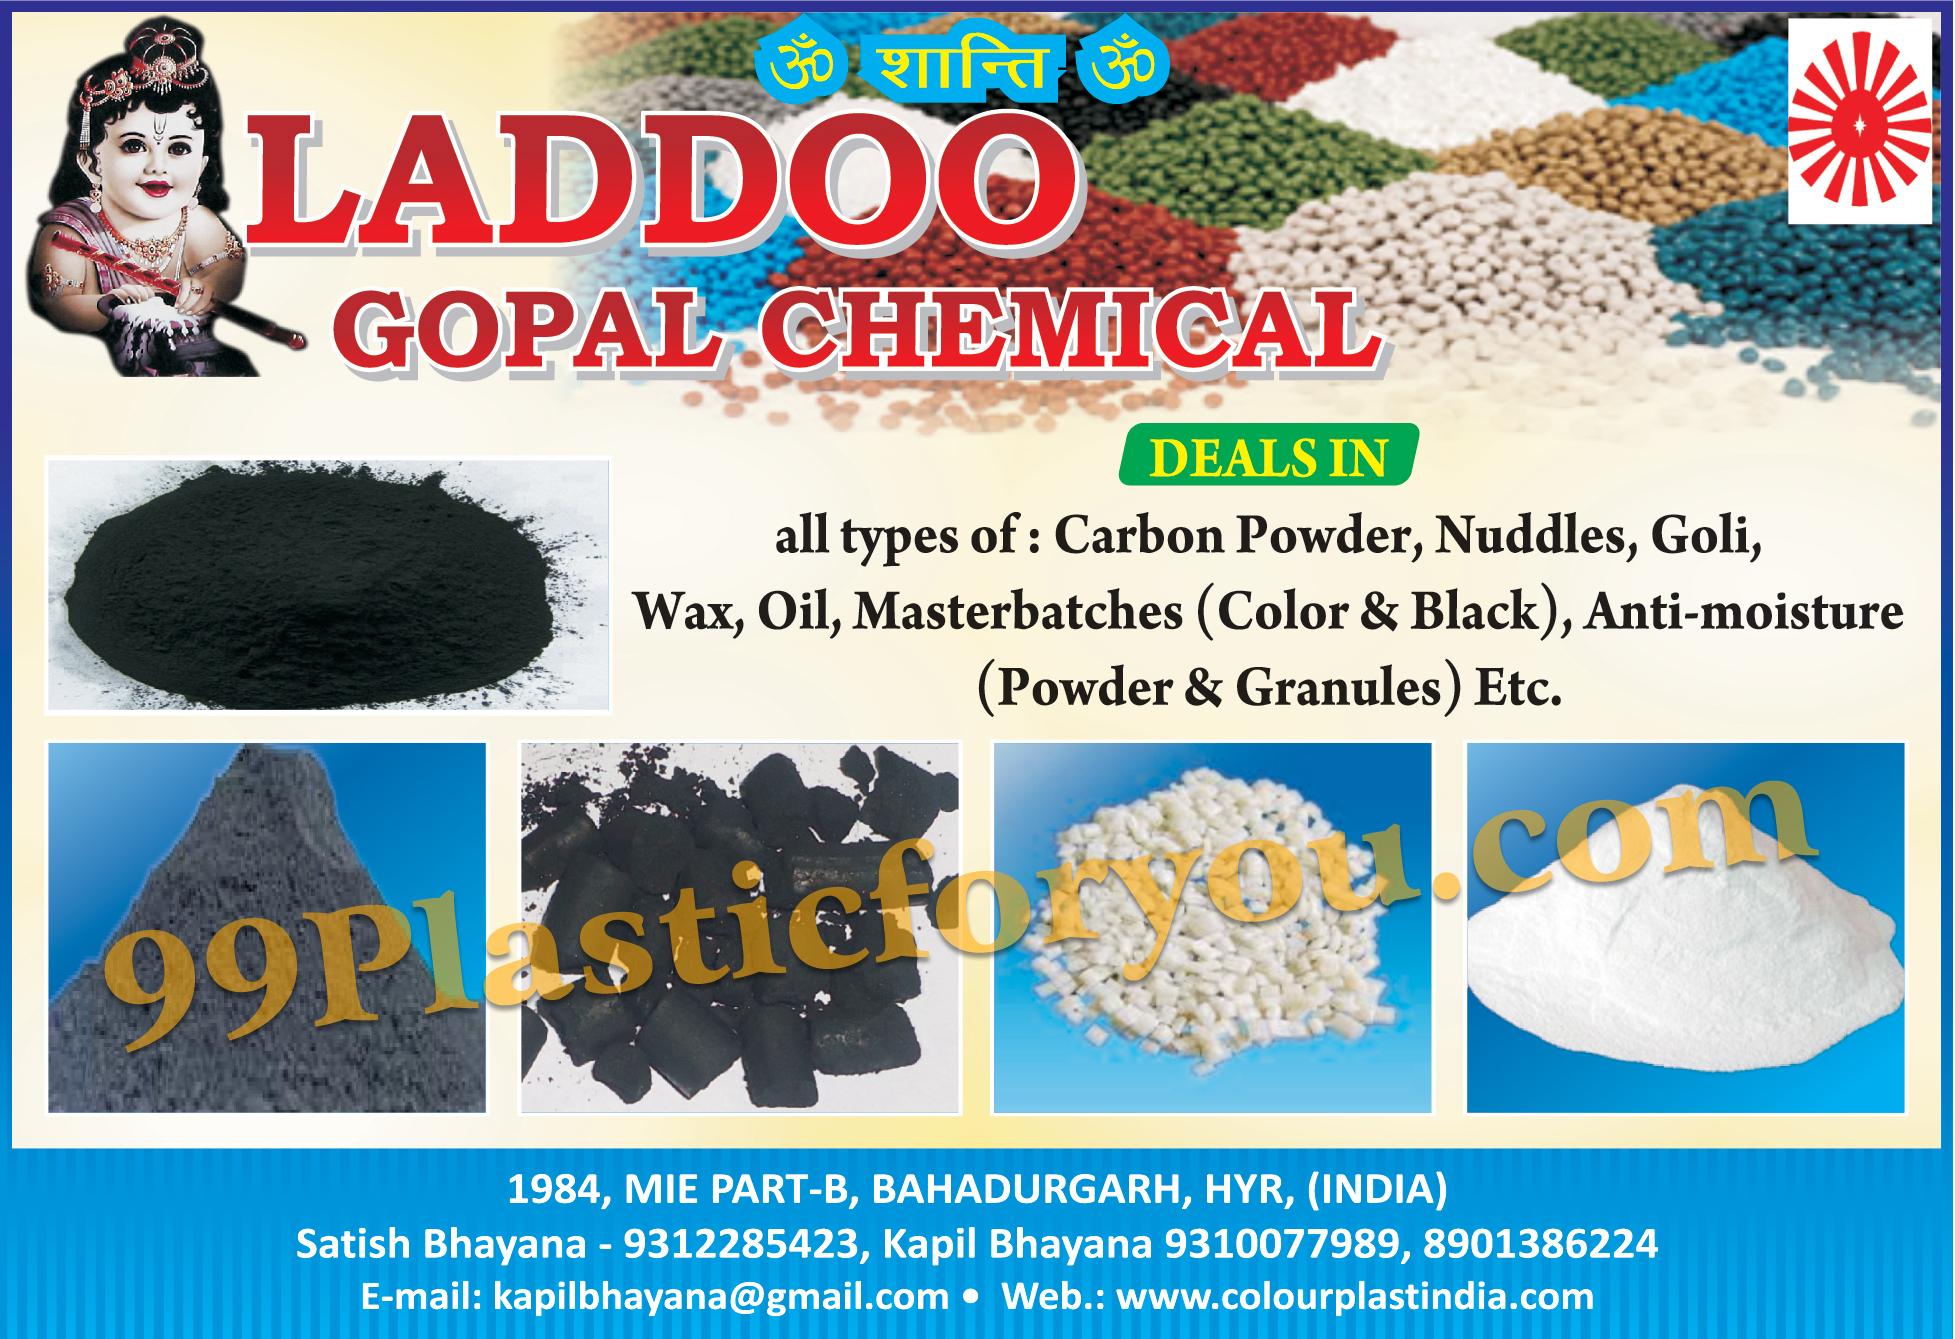 Carbon Powder, Nuddles, Goli, Wax, Oil, Masterbatches, Anti Moisture, Granules